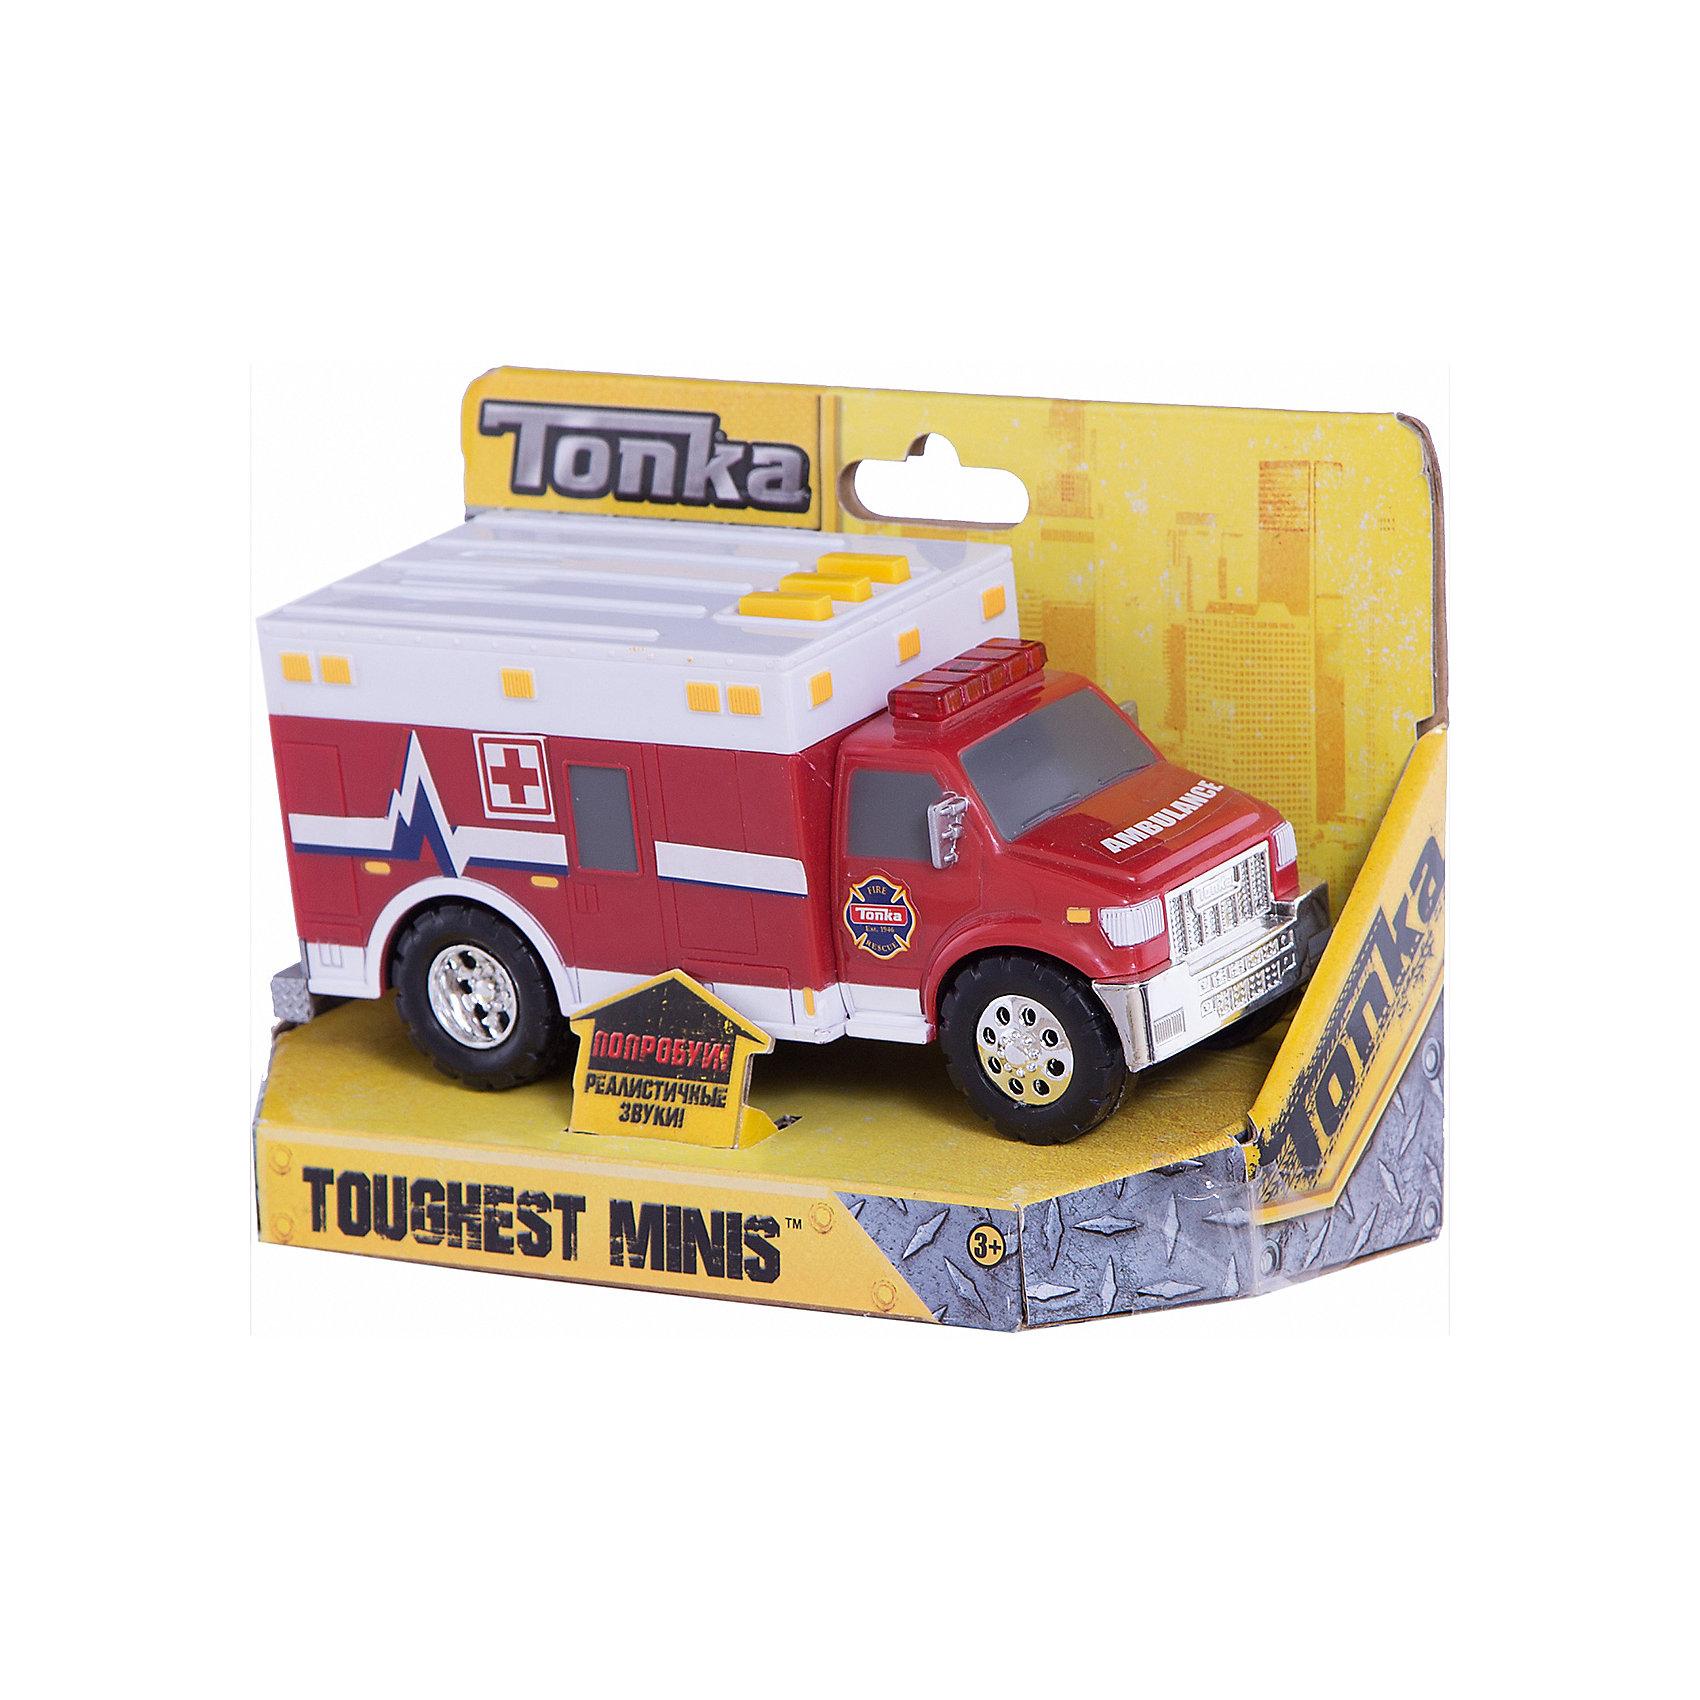 - Медицинская машинка Minis, со светом и звуком, Tonka медицинская машинка minis со светом и звуком tonka